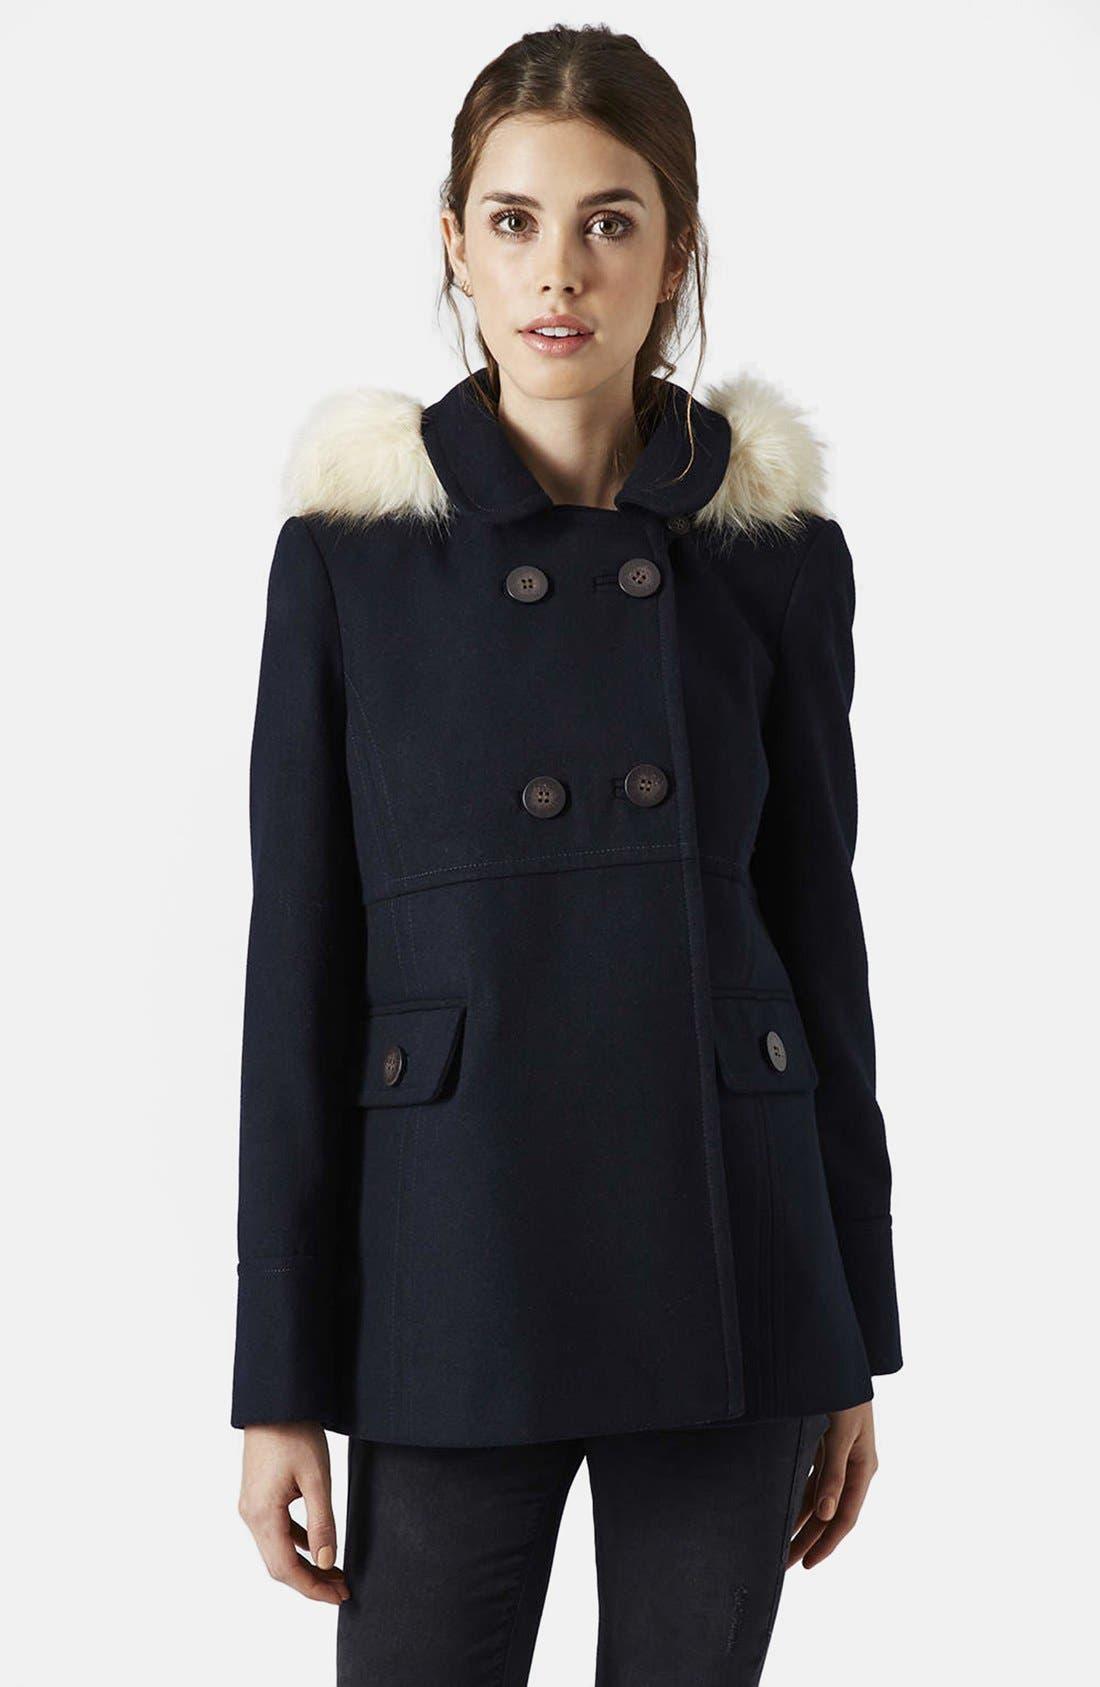 Alternate Image 1 Selected - Topshop 'Lottie' Faux Fur Trim Hooded Coat